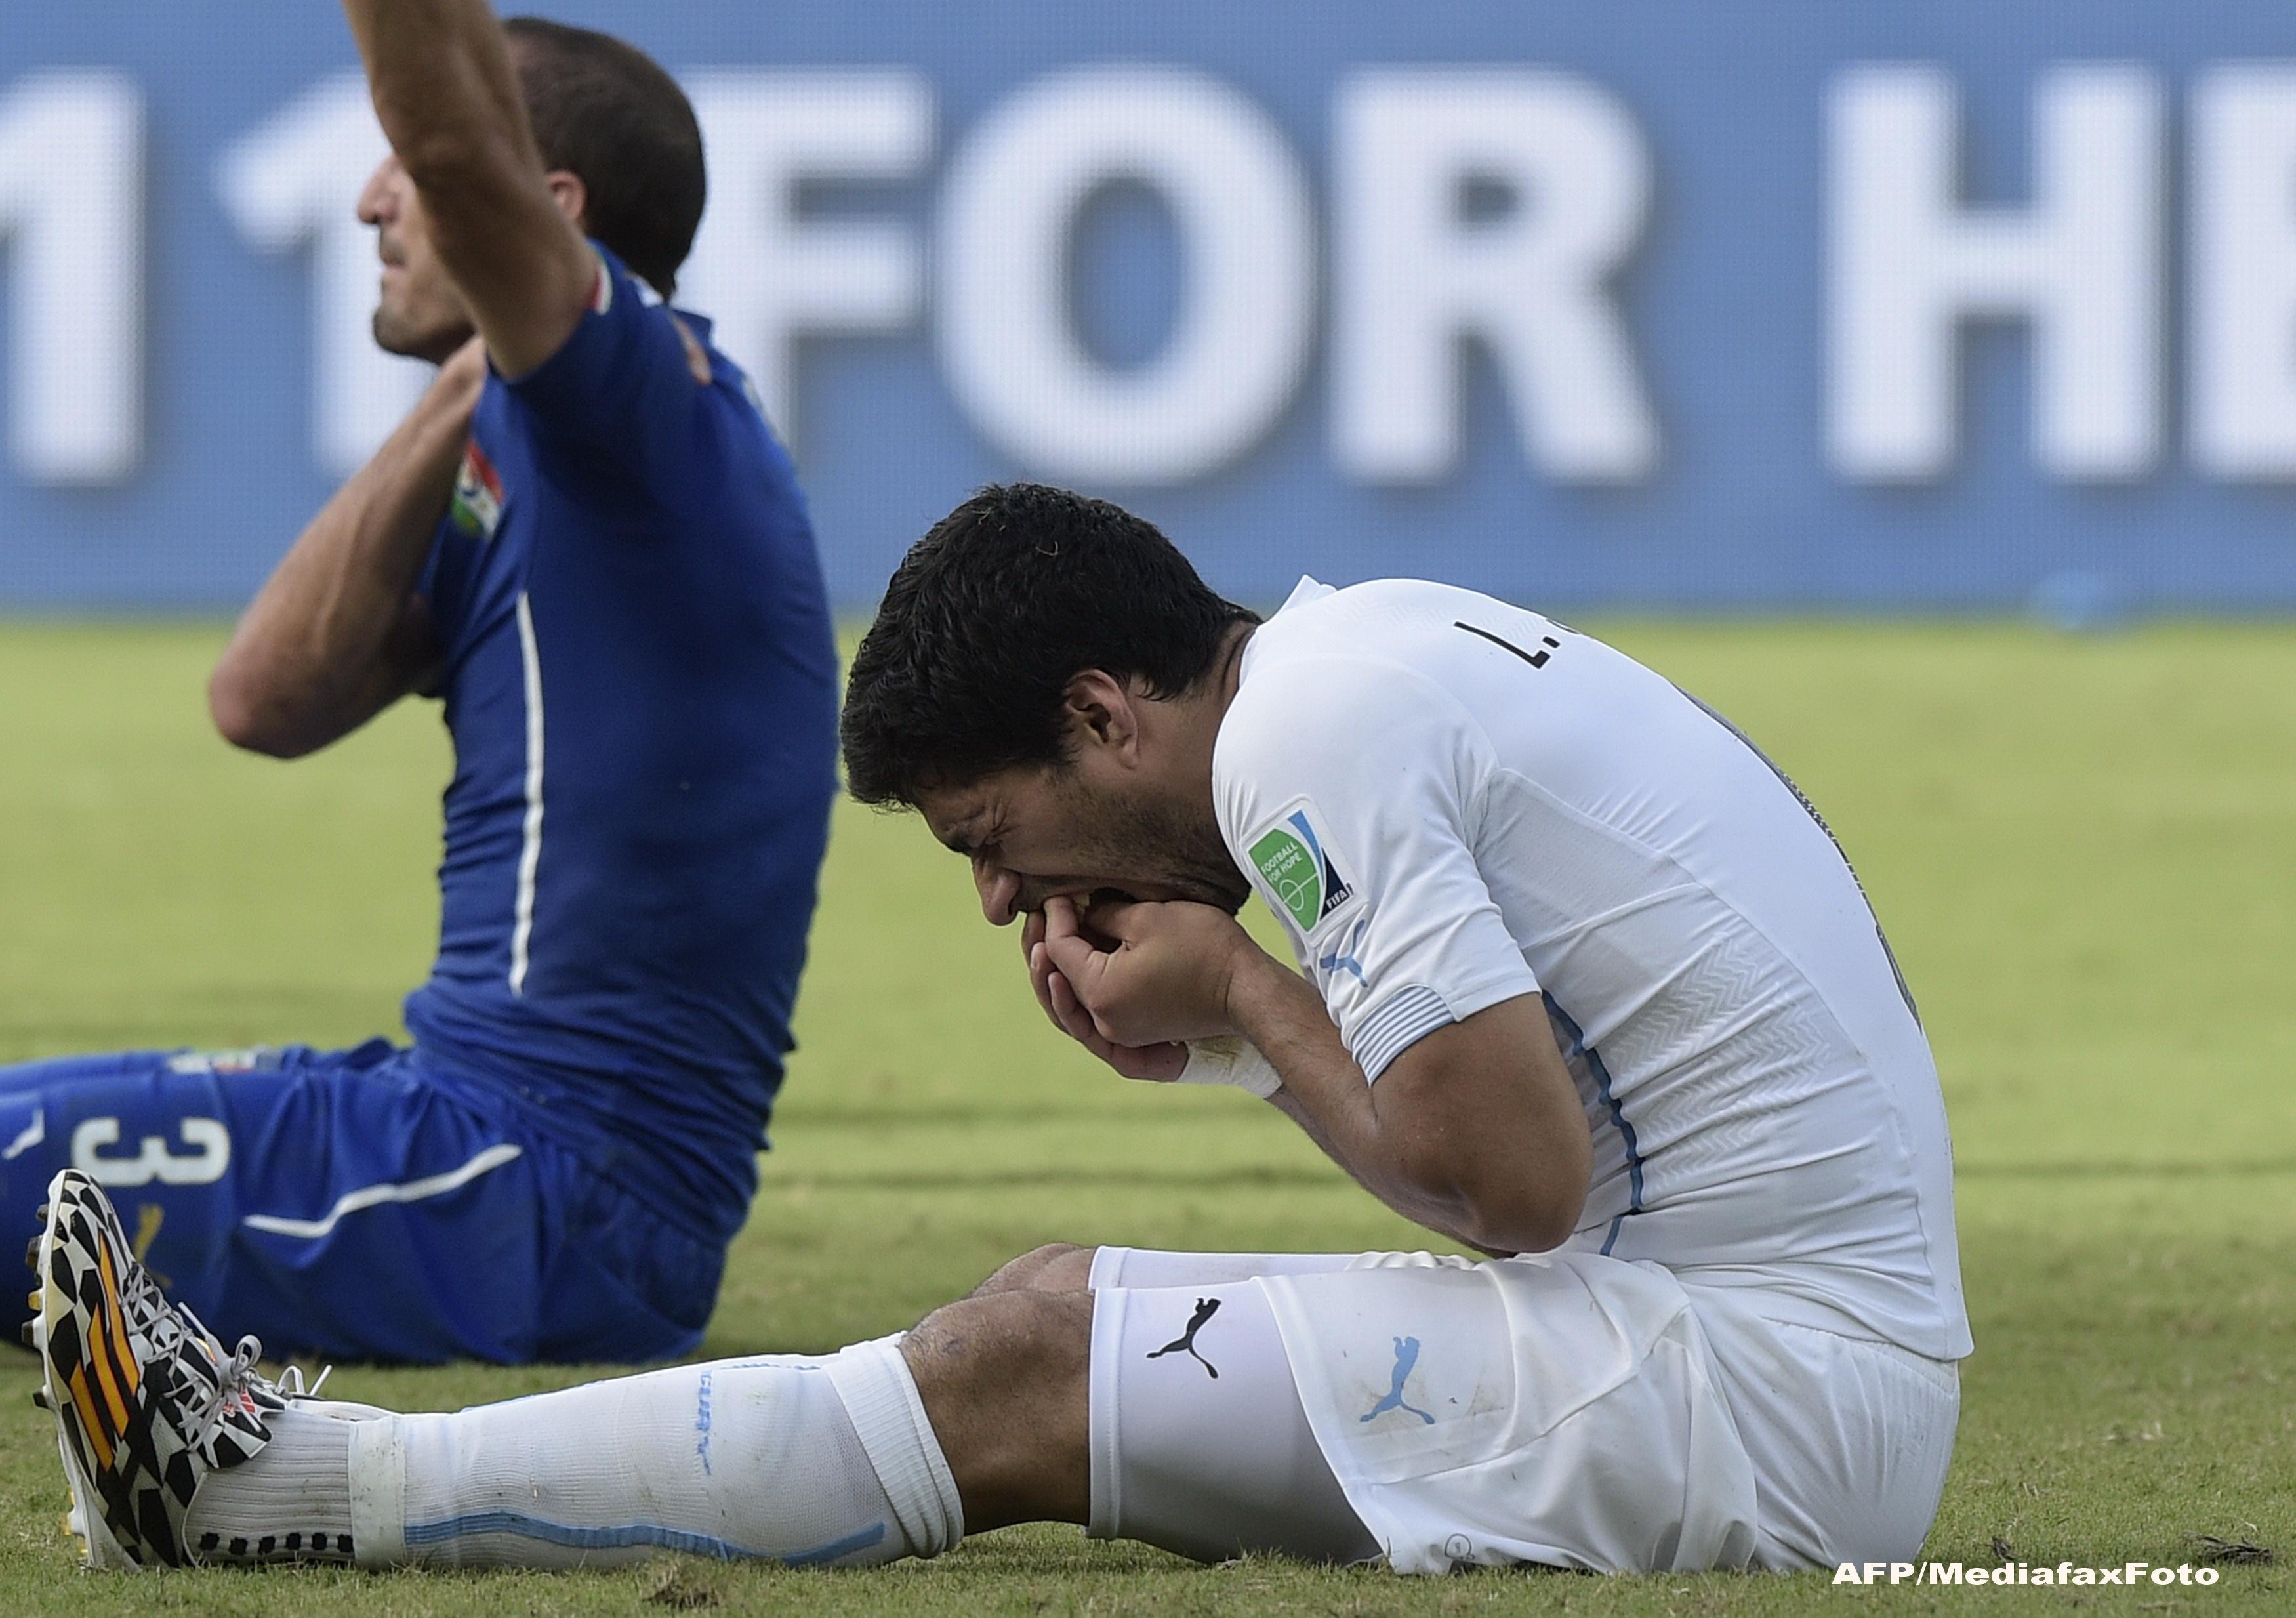 Campionatul Mondial de Fotbal 2014. FIFA va deschide o ancheta in cazul Luis Suarez, care a muscat de umar un fundas